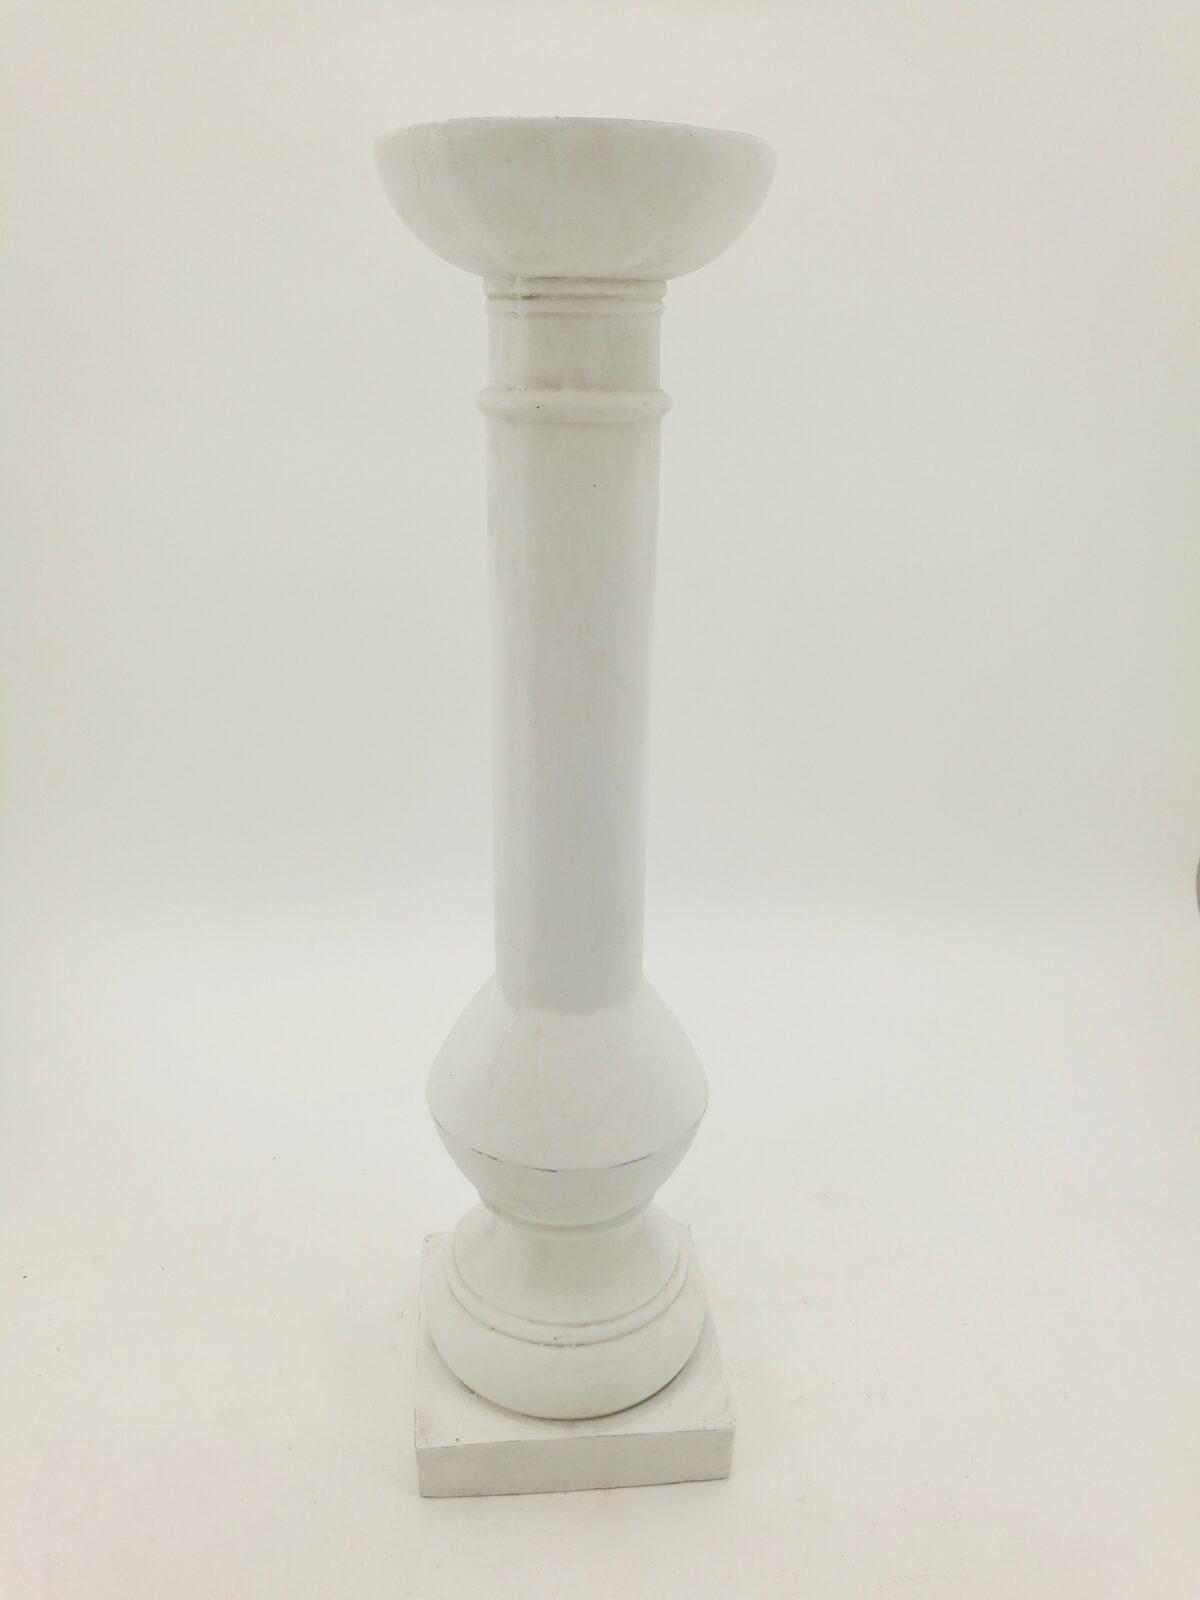 Portacandela cemento bianco D.21,5 H.81